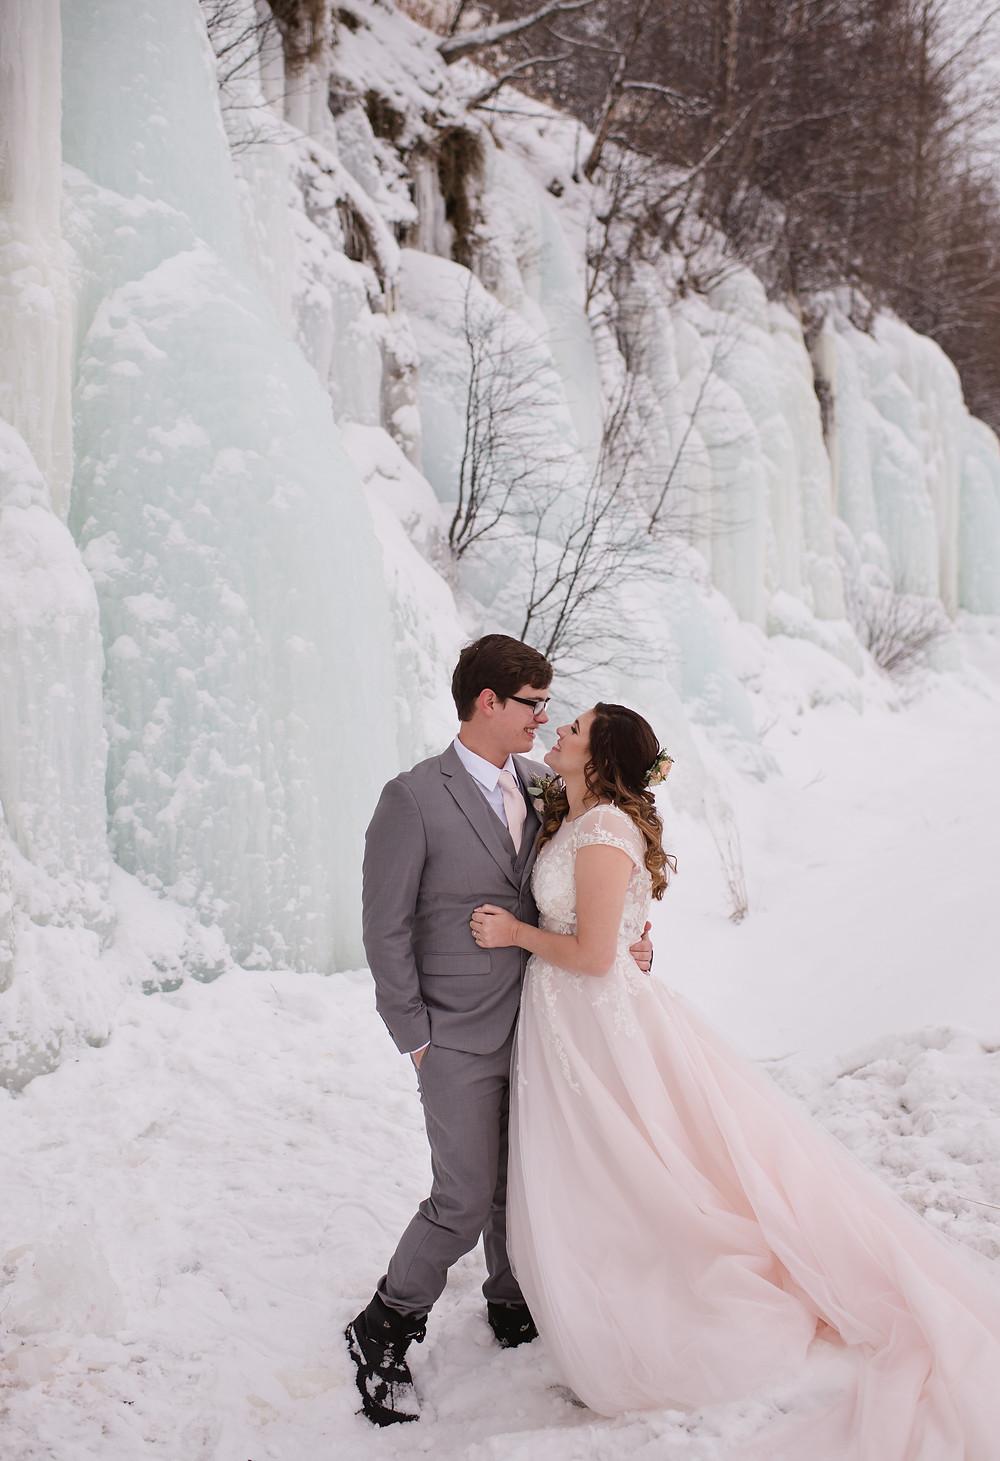 Alaska winter elopement with frozen water fall, ice fall